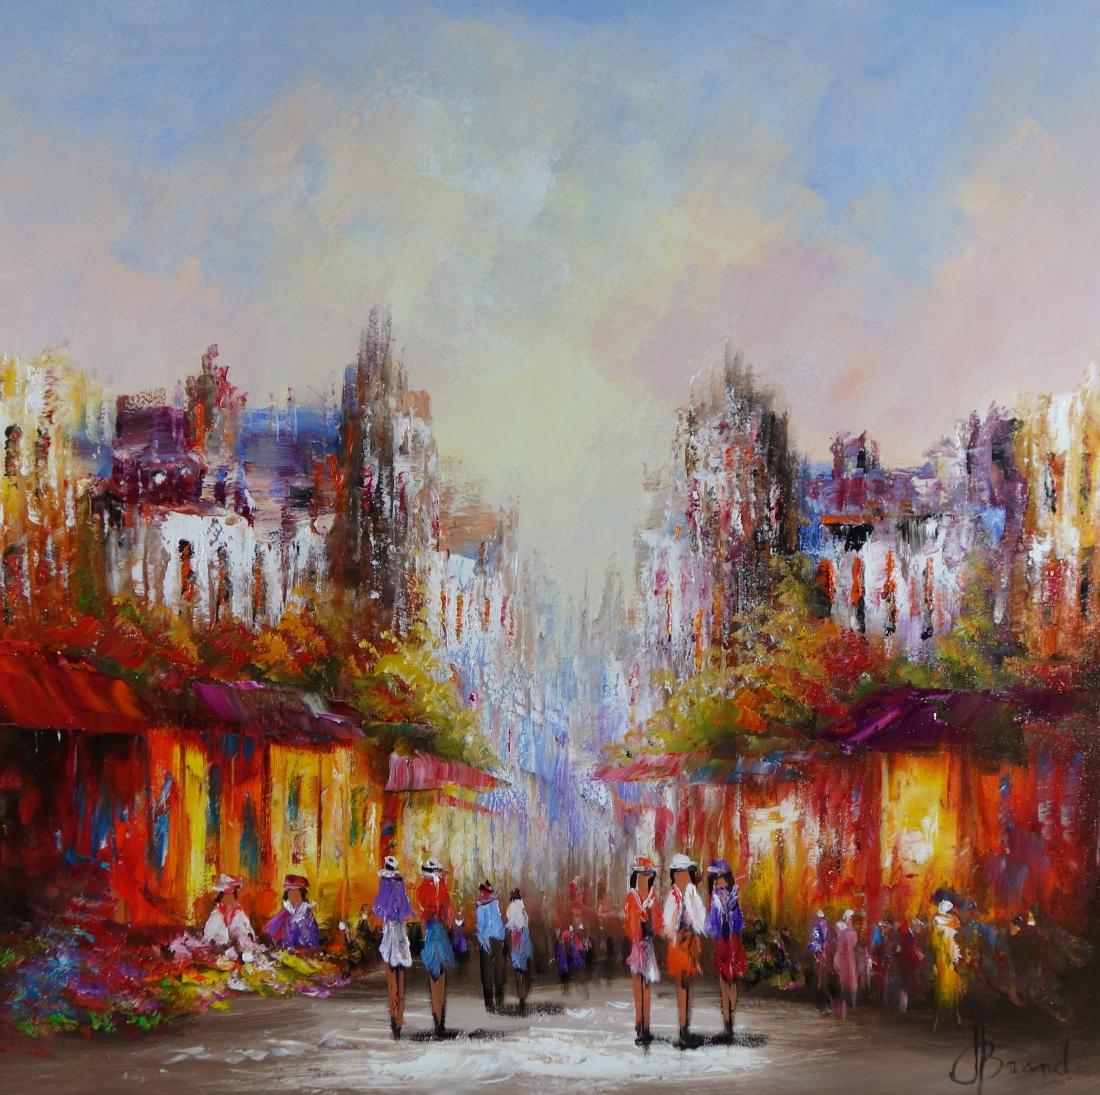 Schilderij bruisende stad 90x90